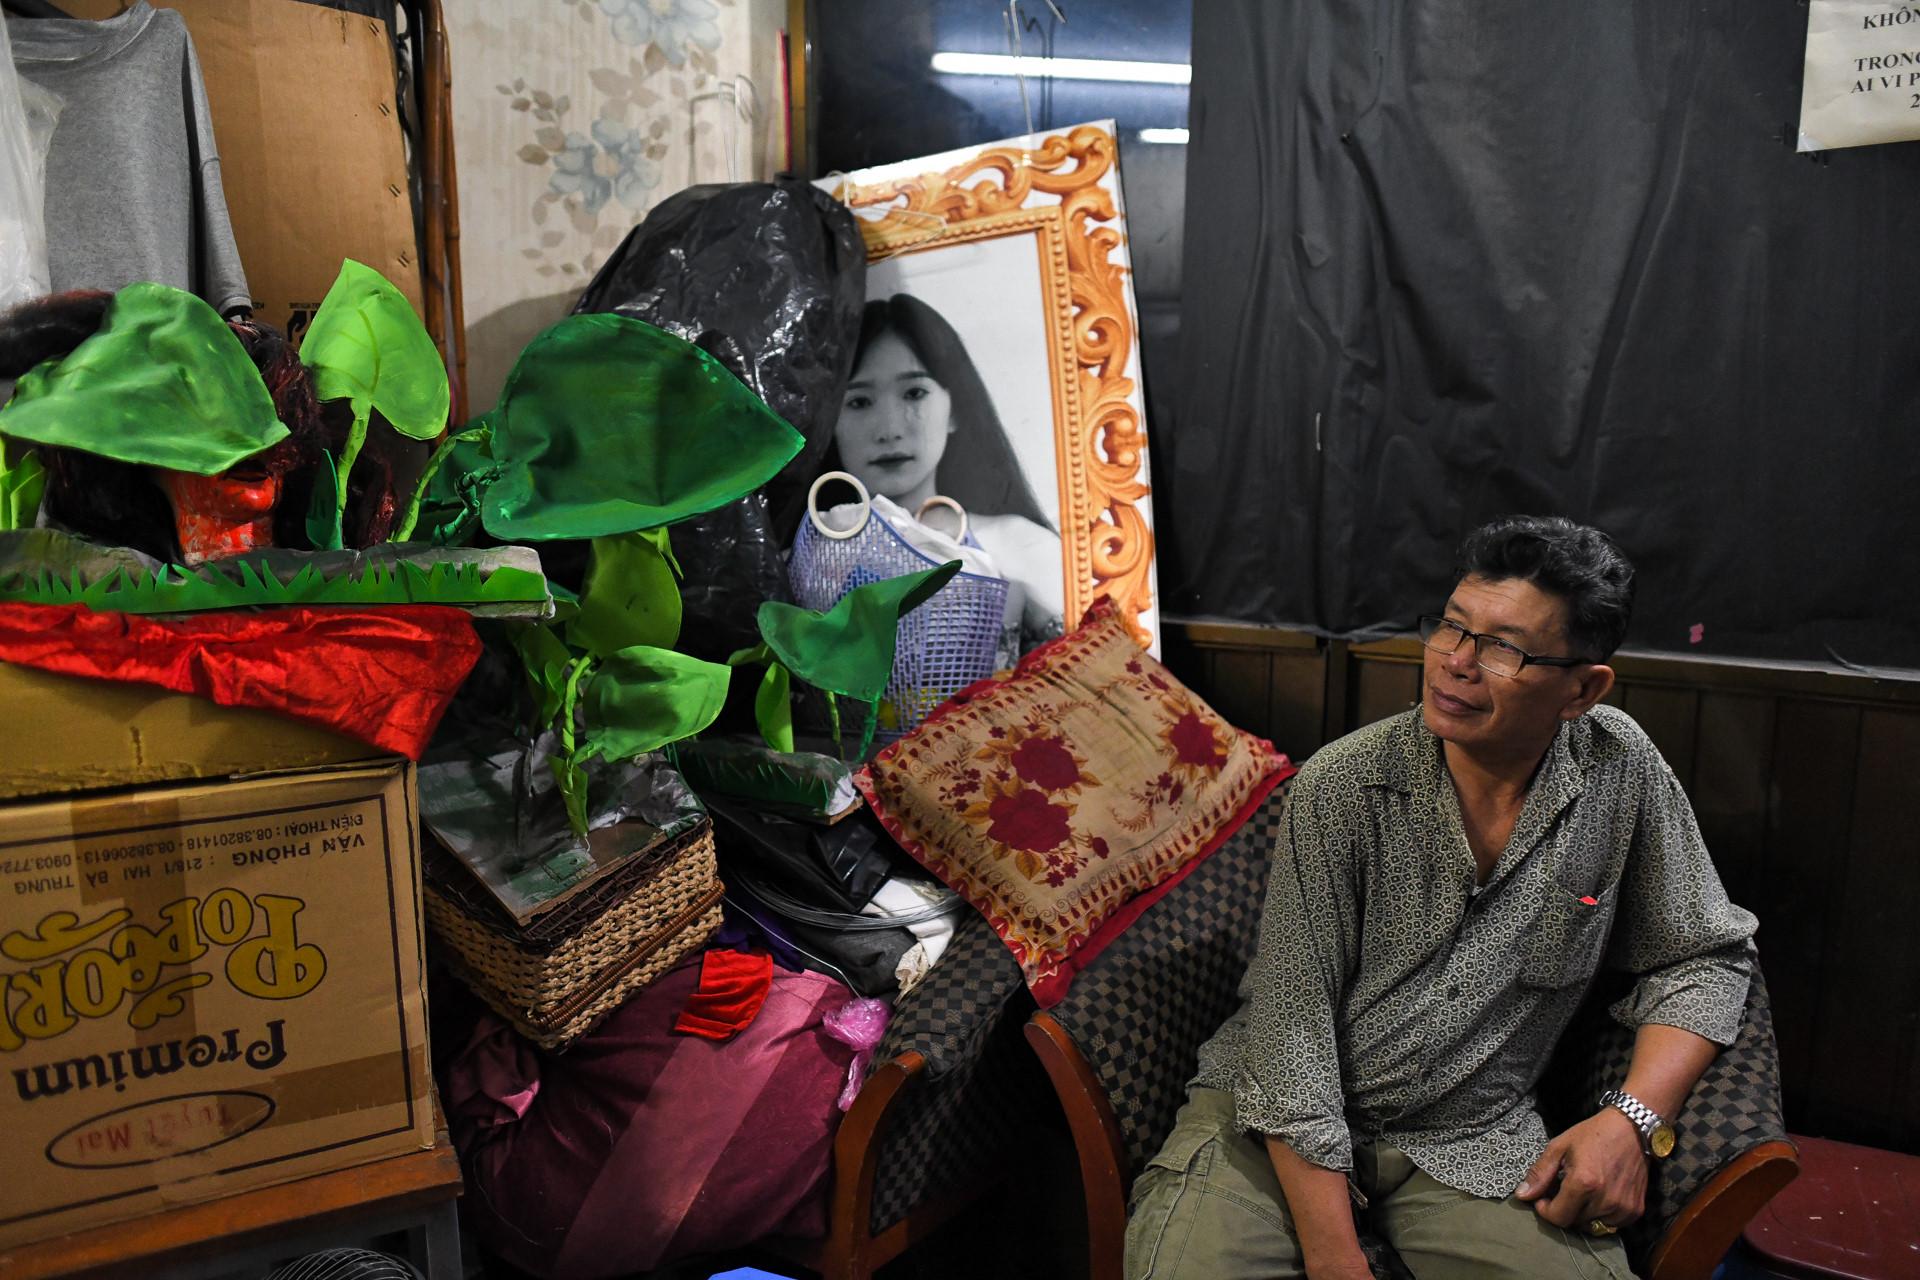 Dem dien cuoi o san khau Hong Van: Chuyen sau tam man nhung hinh anh 11